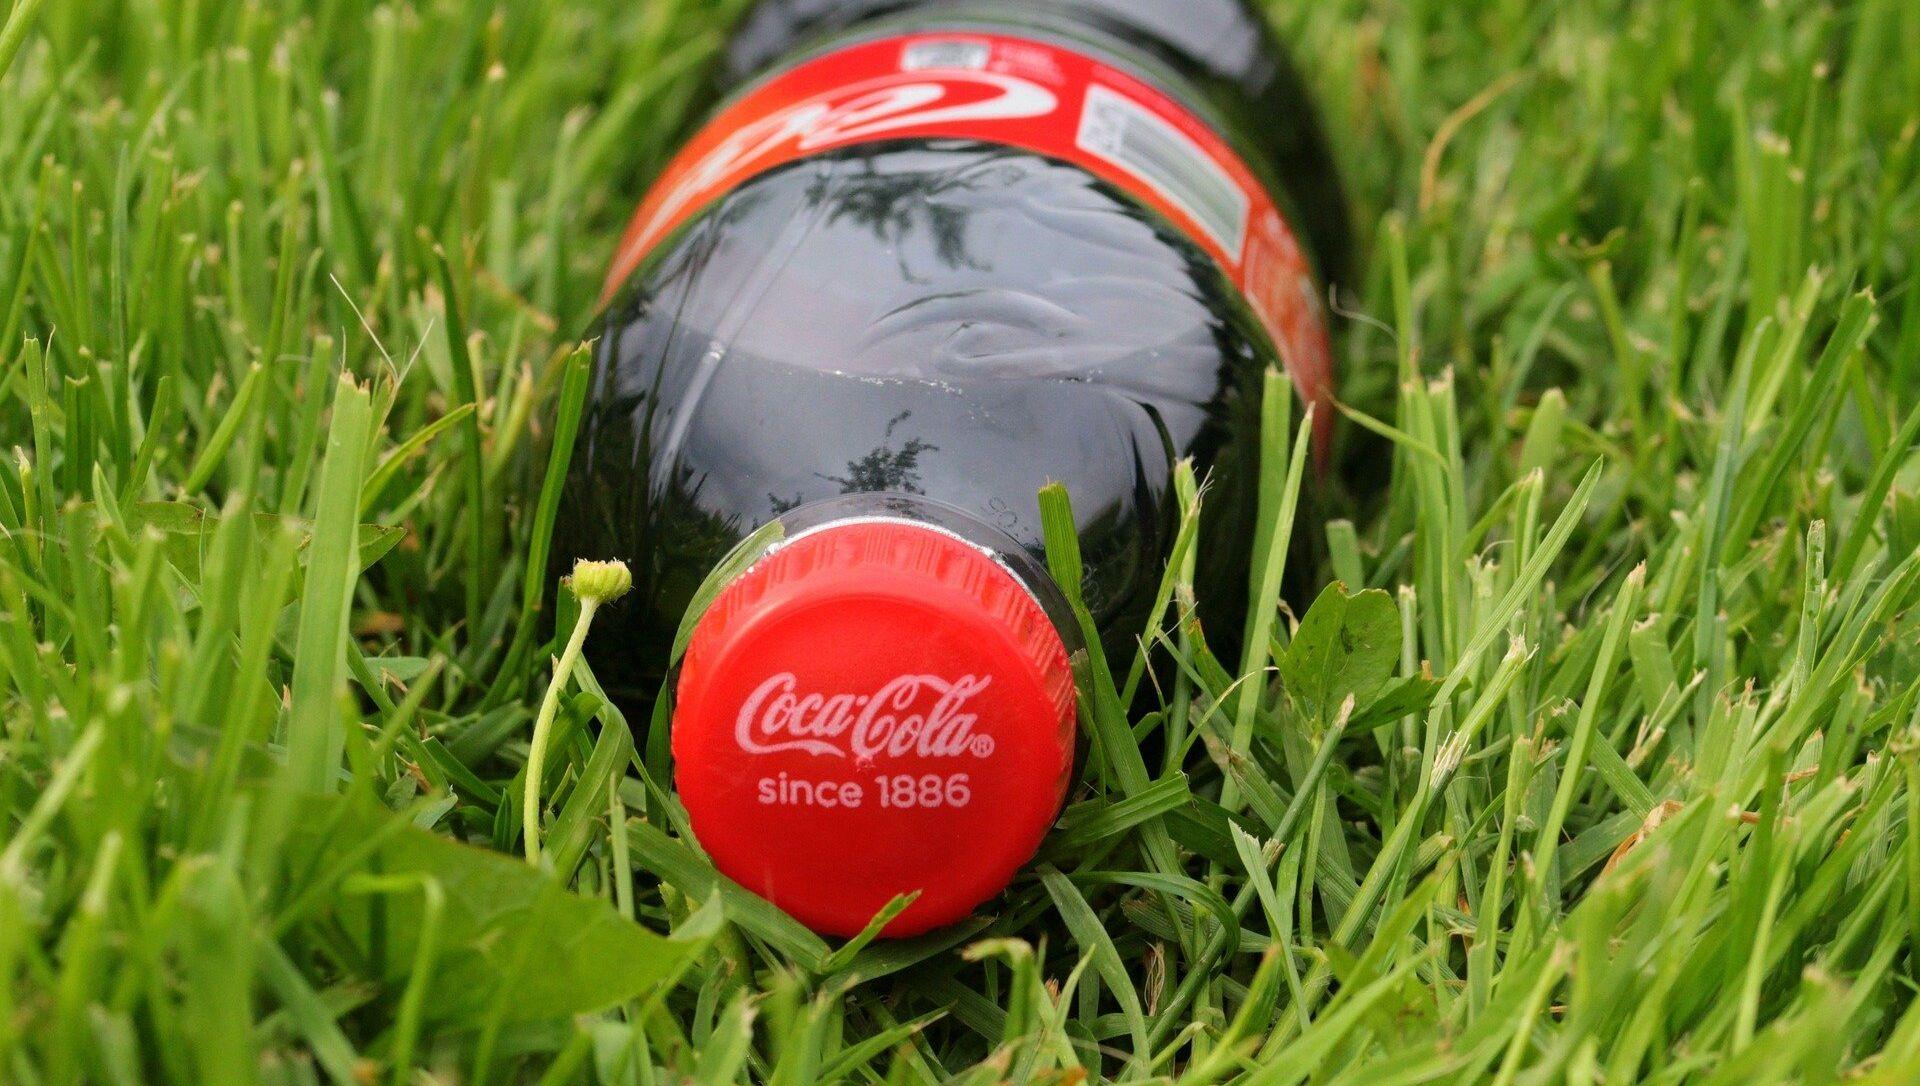 Una botela de Coca-Cola - Sputnik Mundo, 1920, 10.02.2021